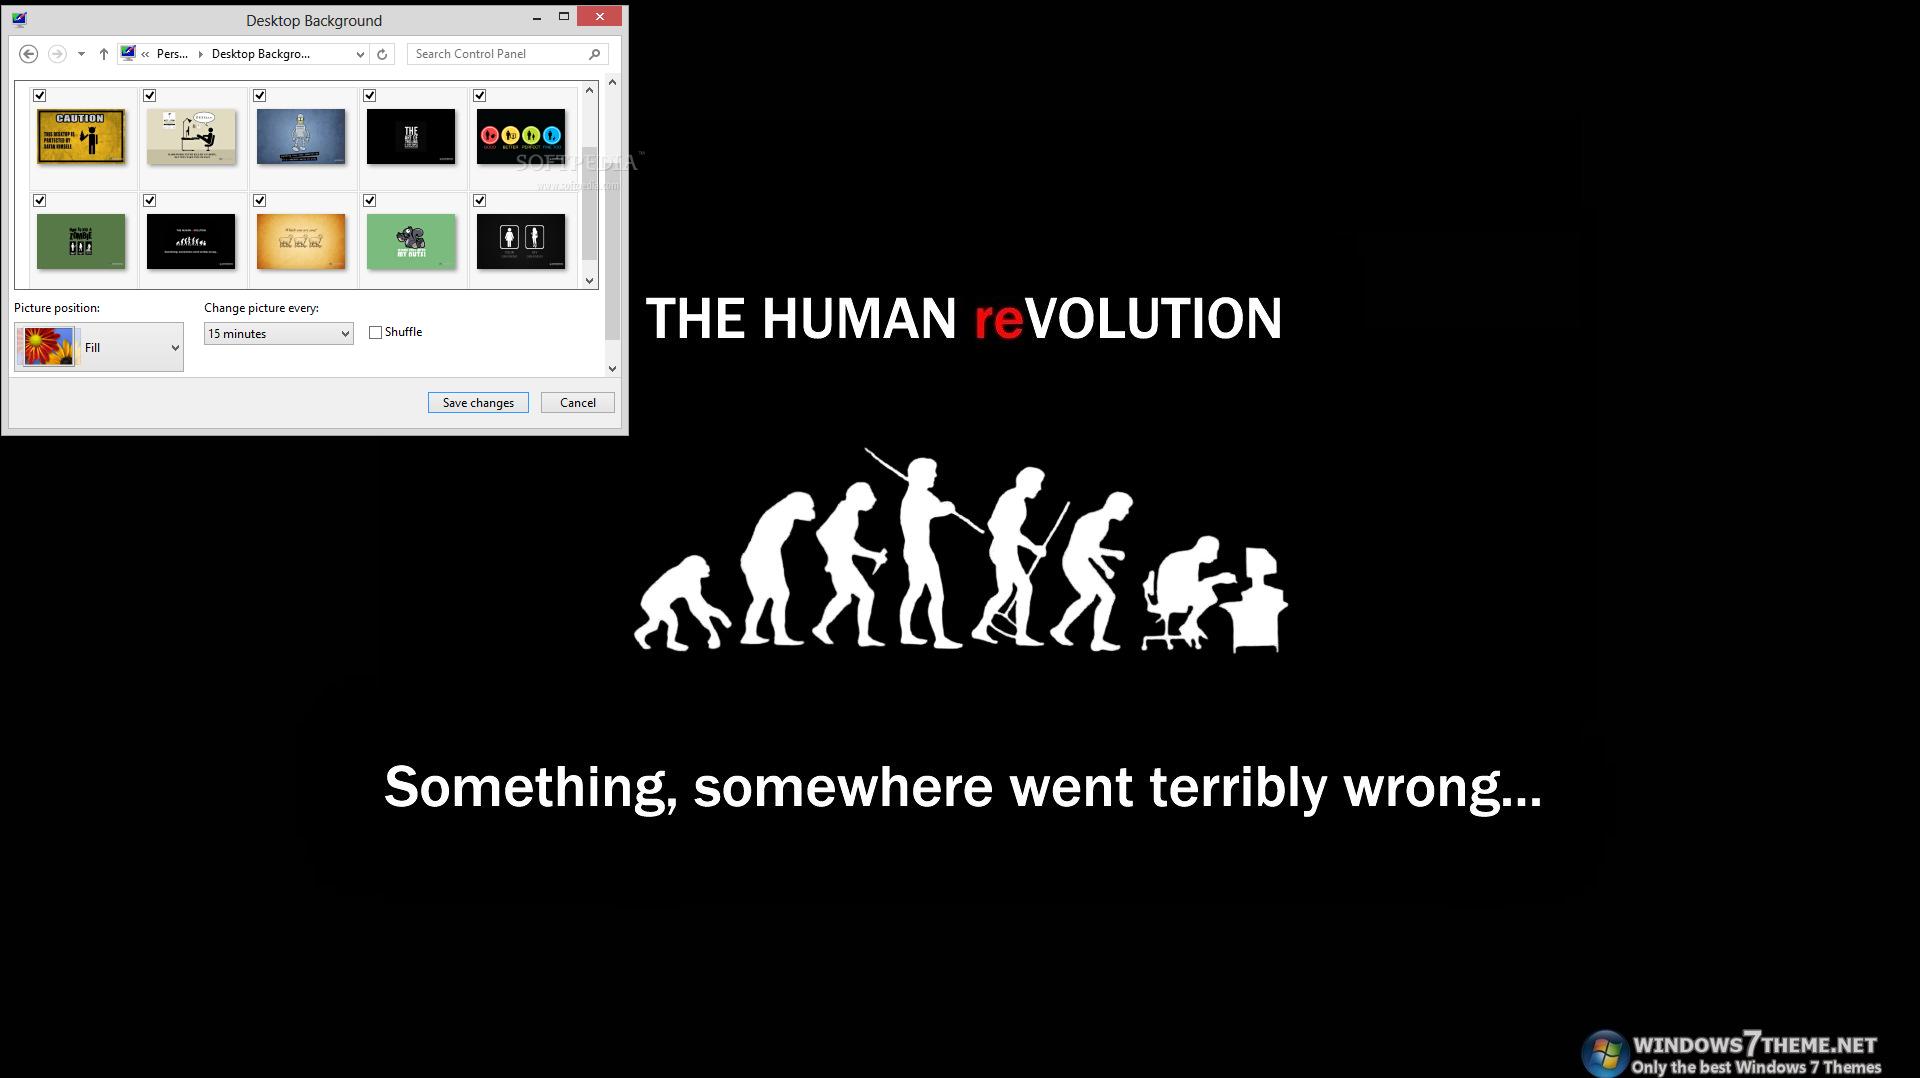 Windows Desktop Images Windows Backgrounds Memes